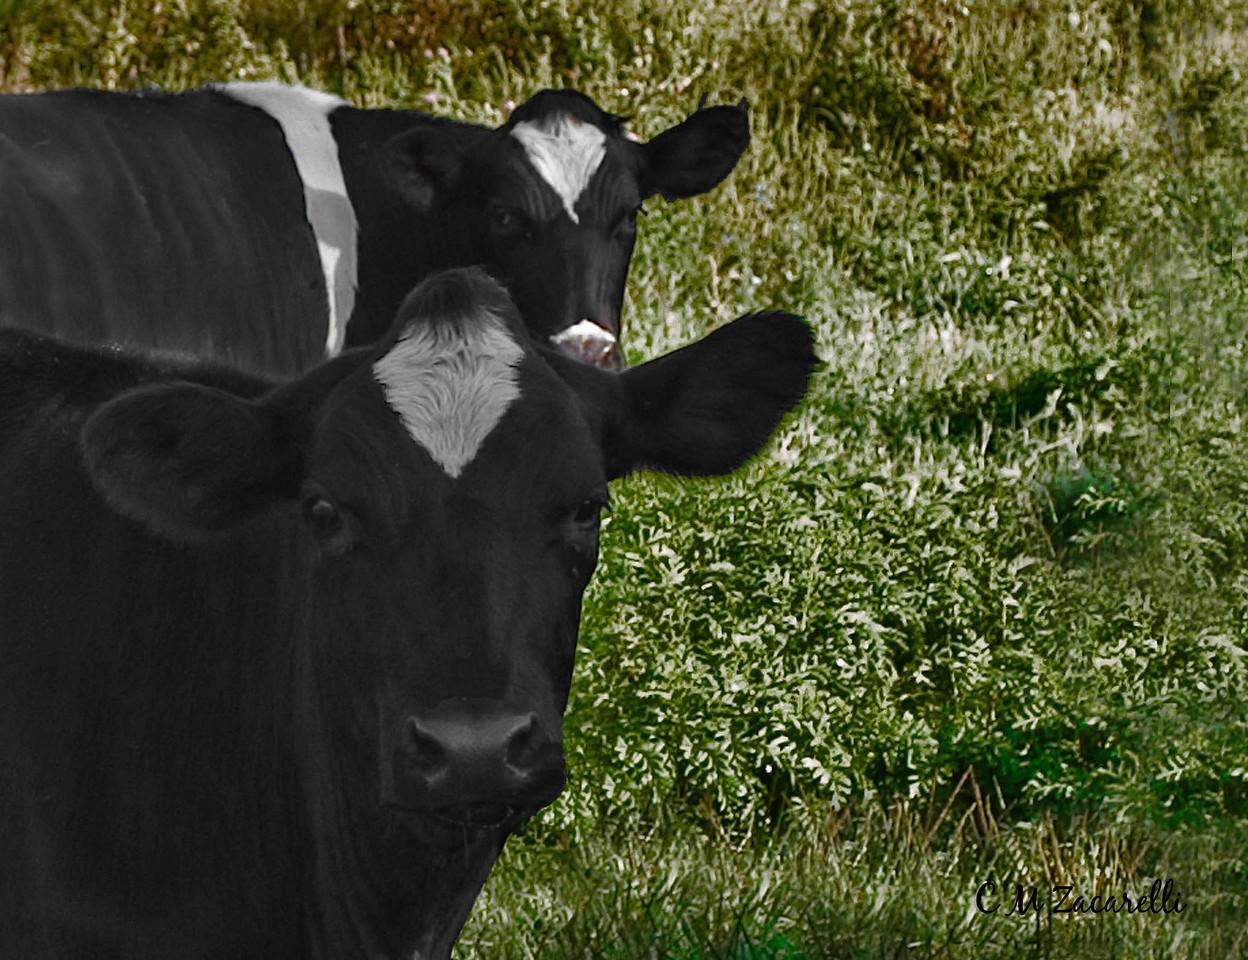 cow, cows, two cows, moo, looking, farm, scene, scenery, farm life, wallingford, ct.